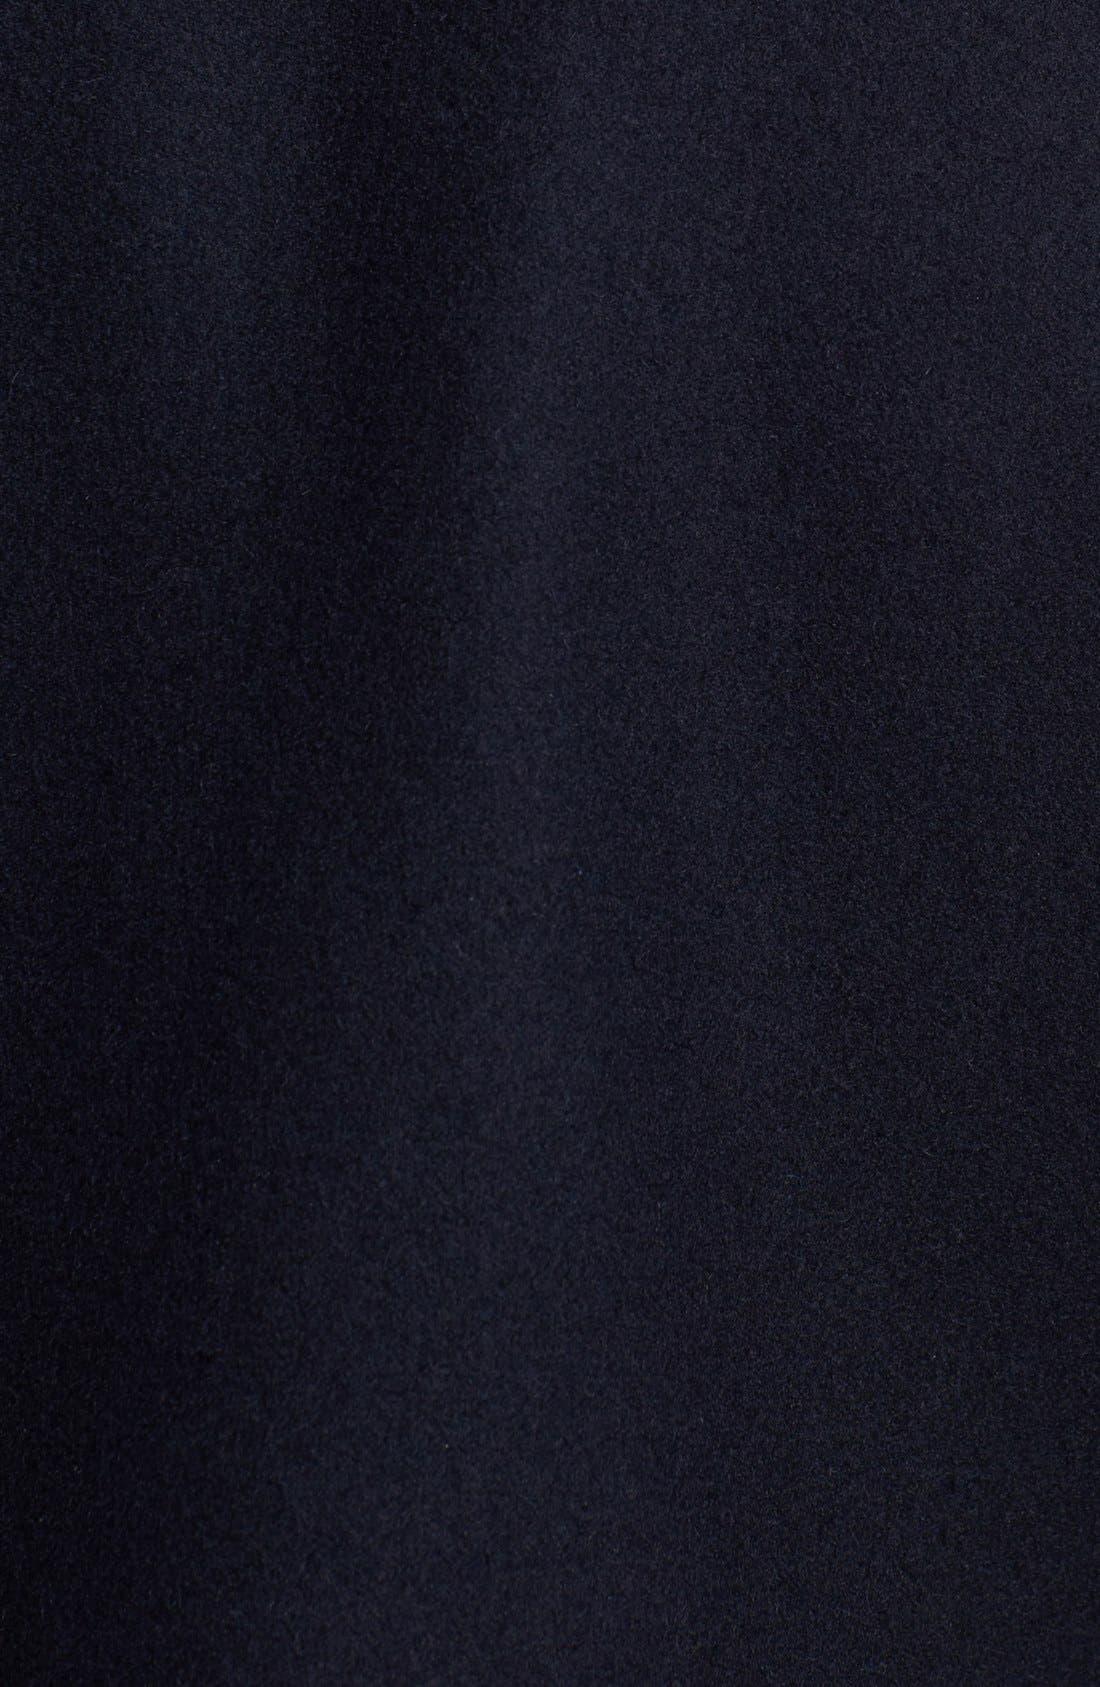 Alternate Image 3  - Victorinox Swiss Army® 'Lieutenant' Jacket